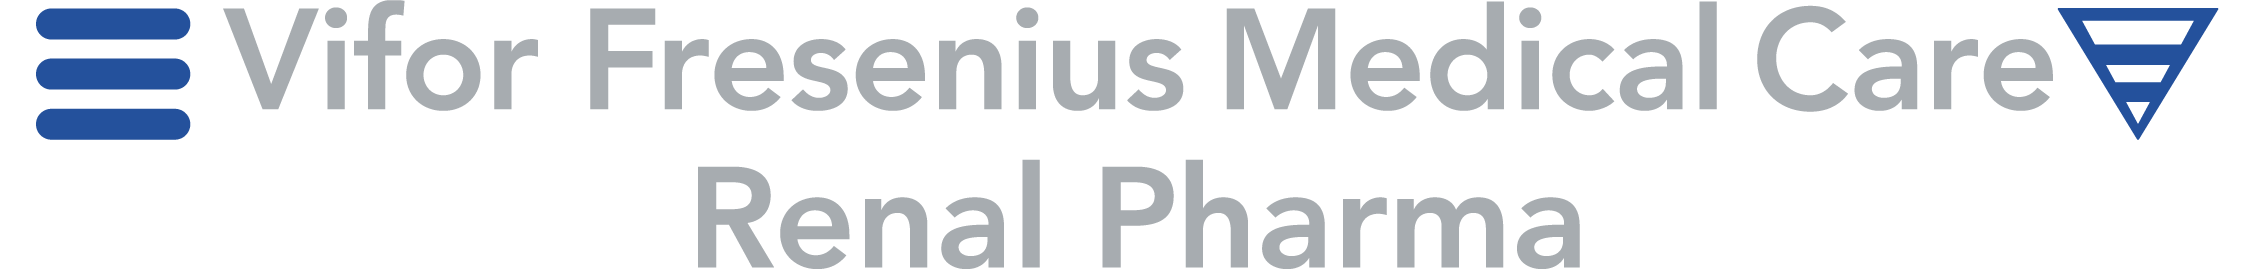 110915_04_vifor_fresenius_logo